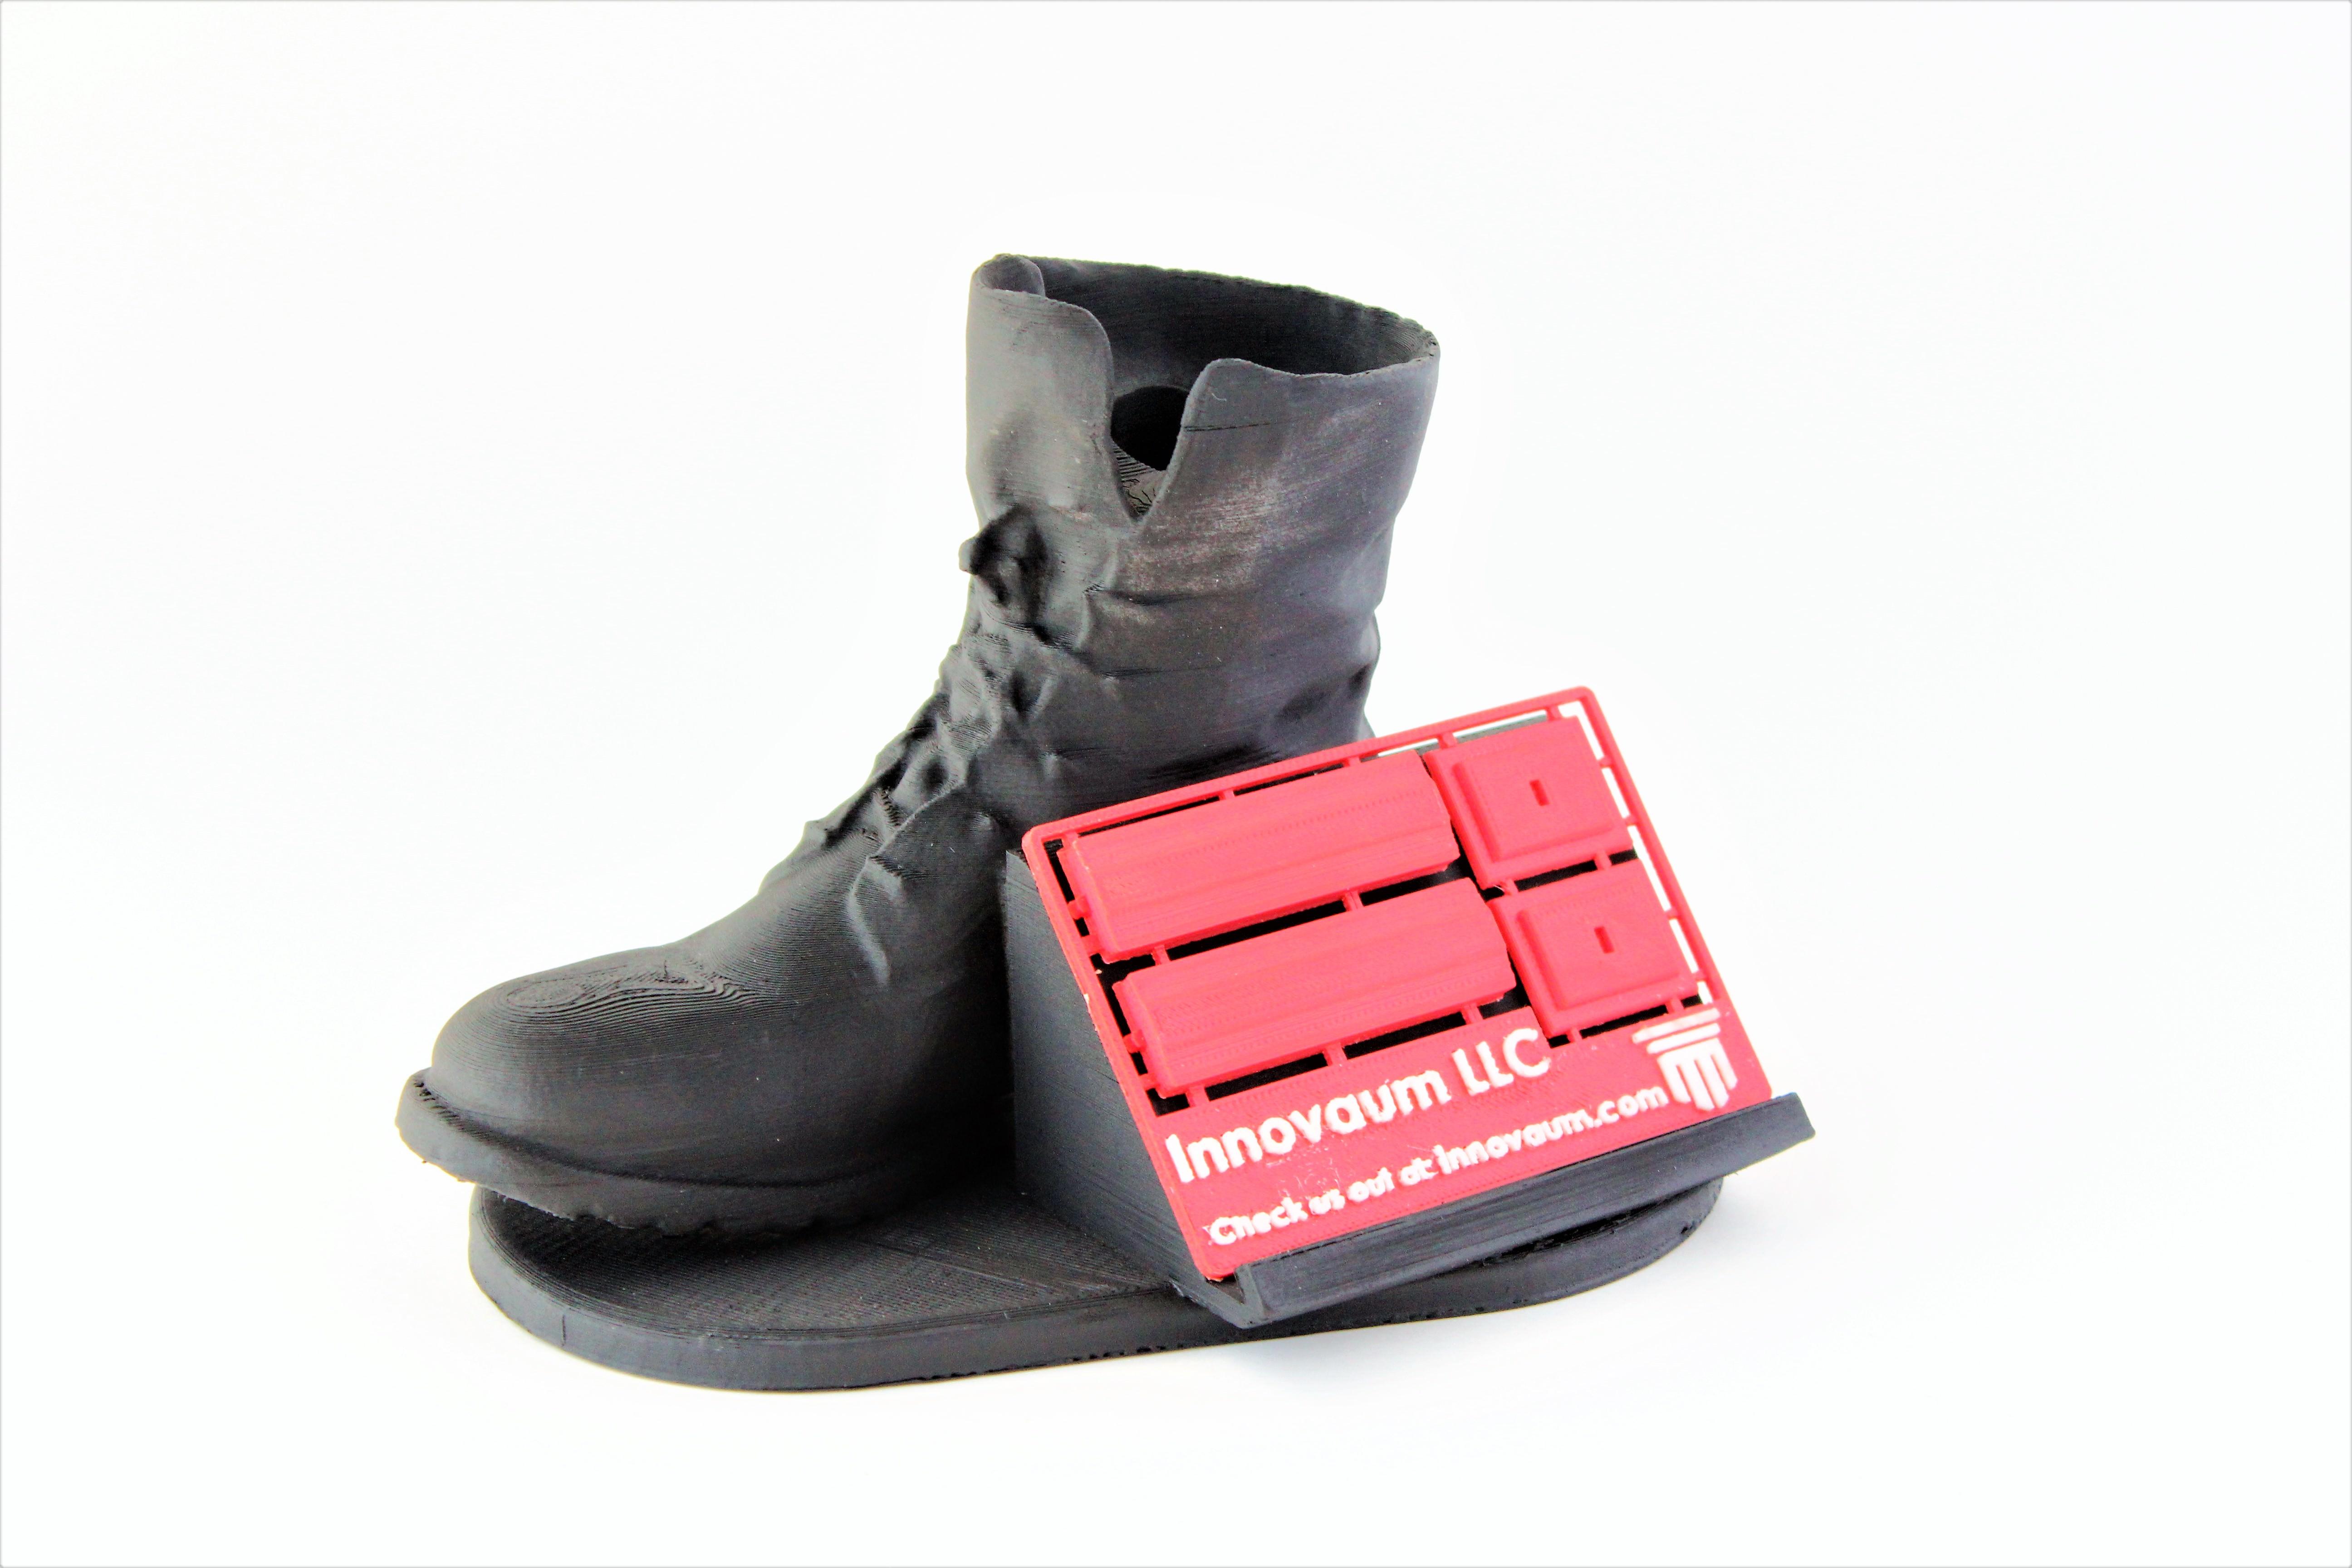 Business card holder innovaum business card holder colourmoves